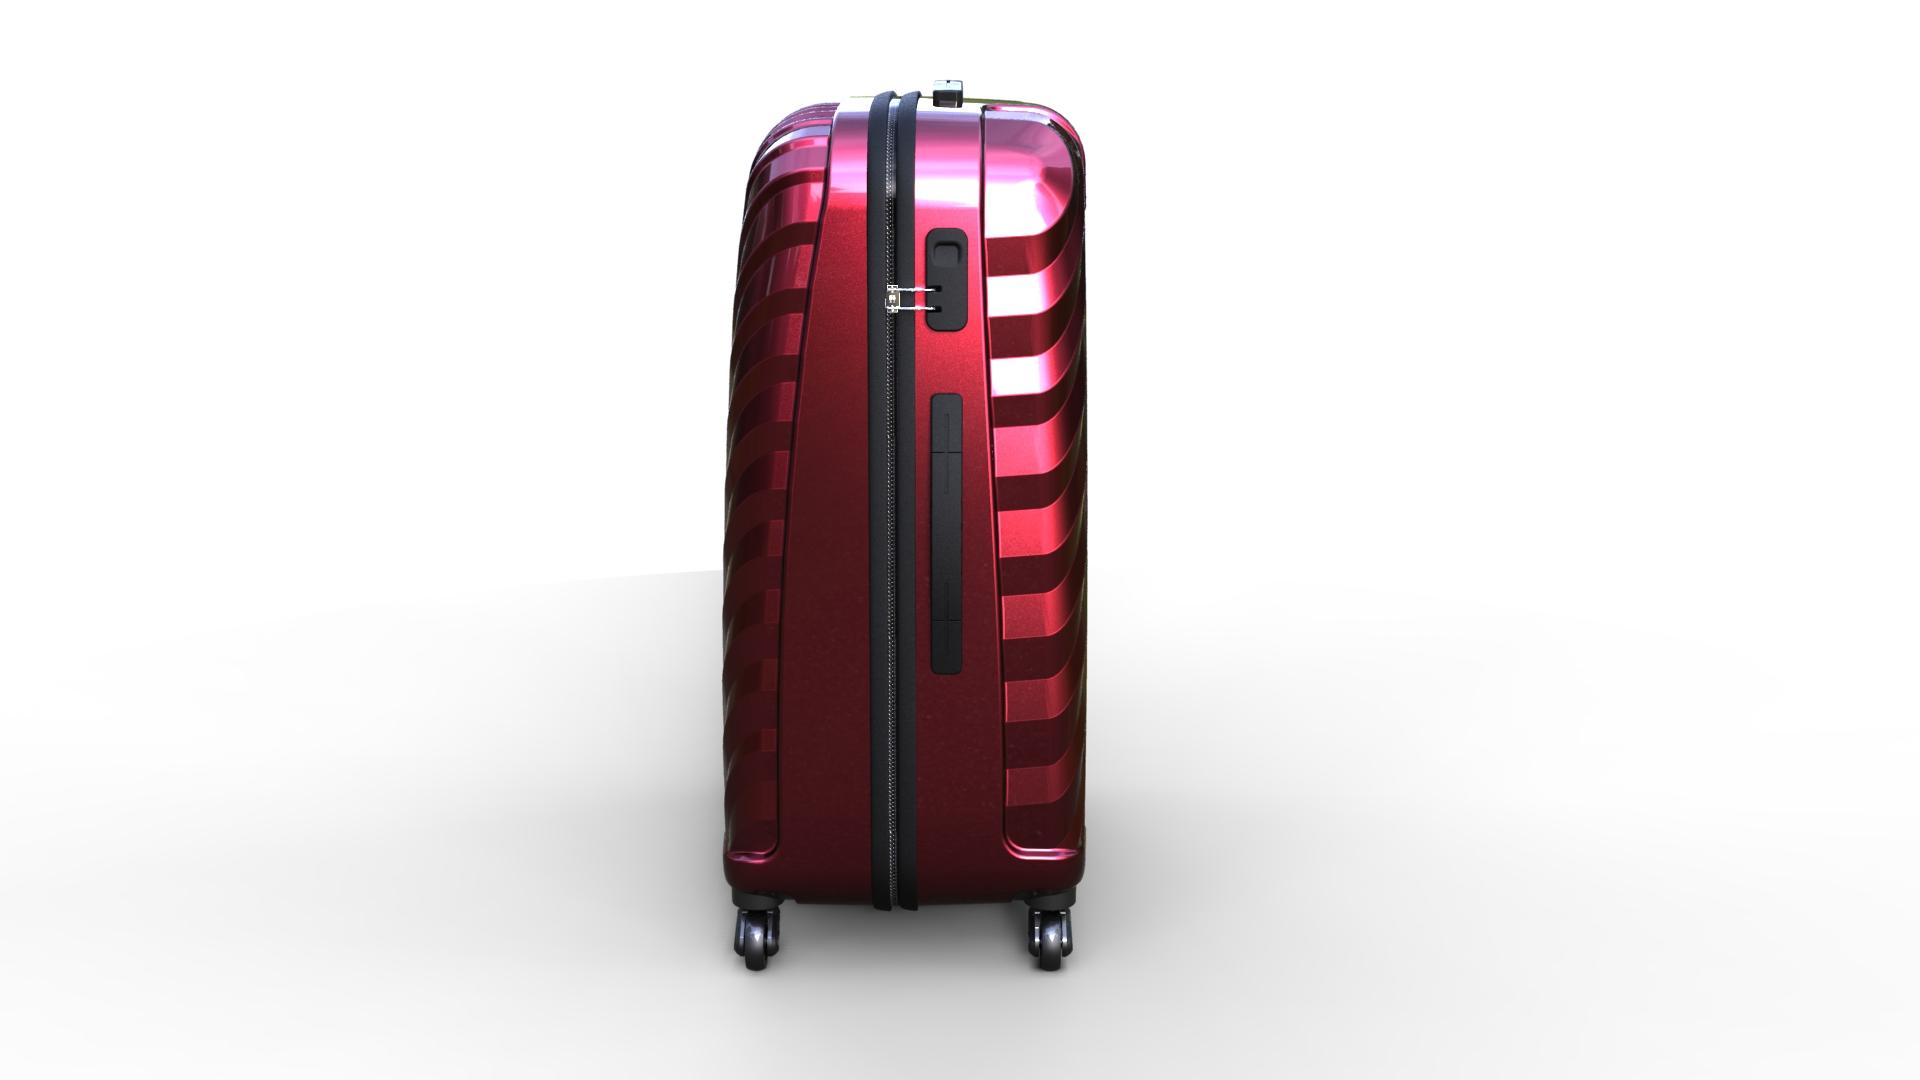 trolley suitcase bag 03 3d model max fbx ma mb obj 286001